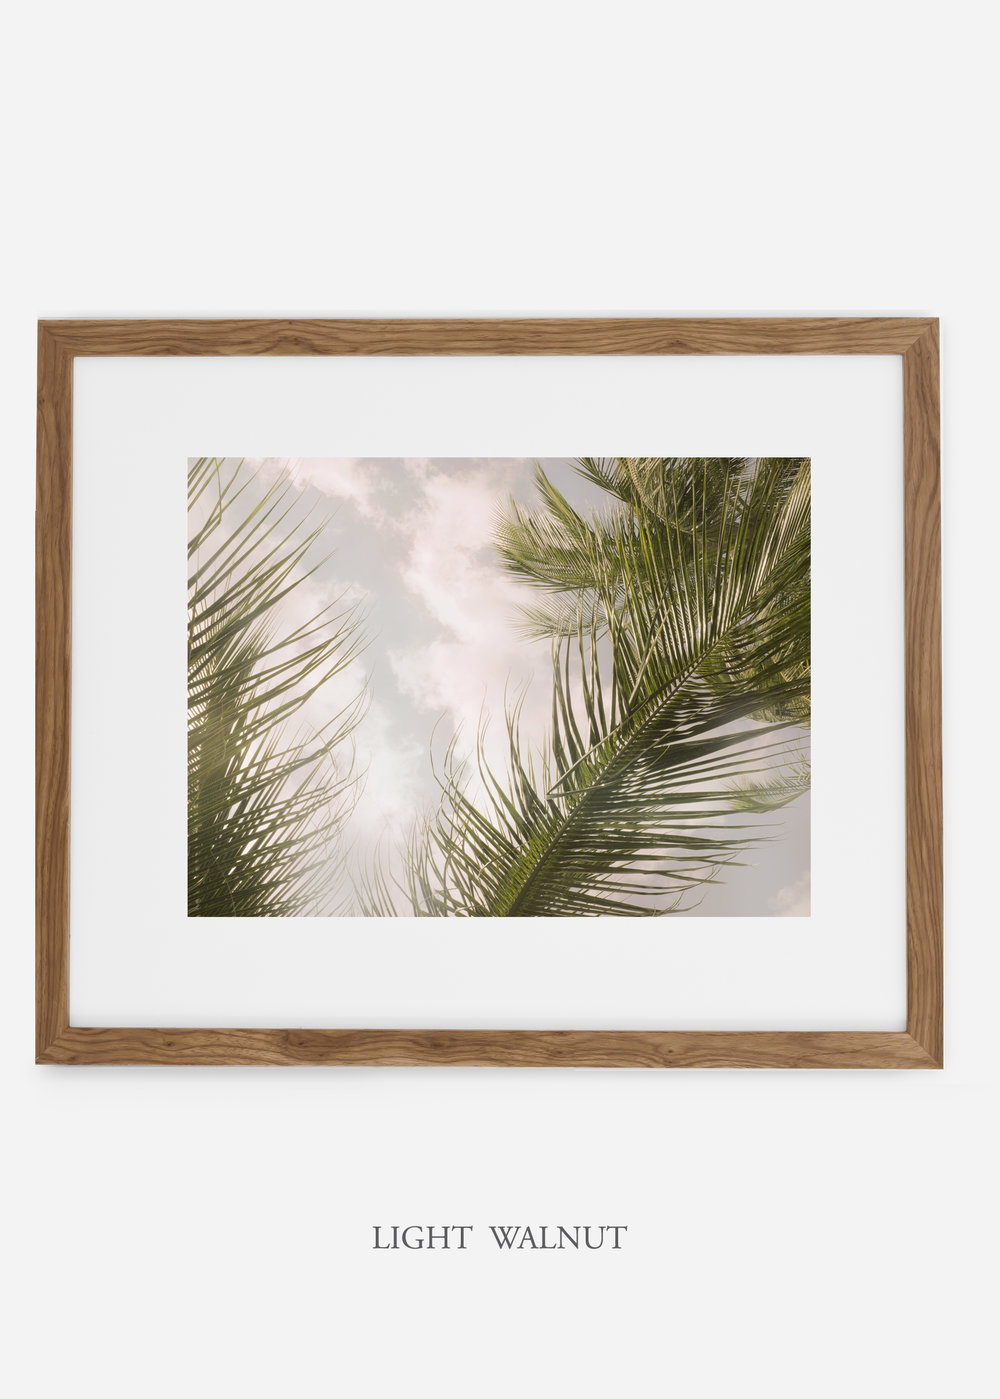 interiordesign_lightwalnutframe_AiryPalmTreeNo.1_art_tropical_palmtree_StormyGrayPalm.jpg